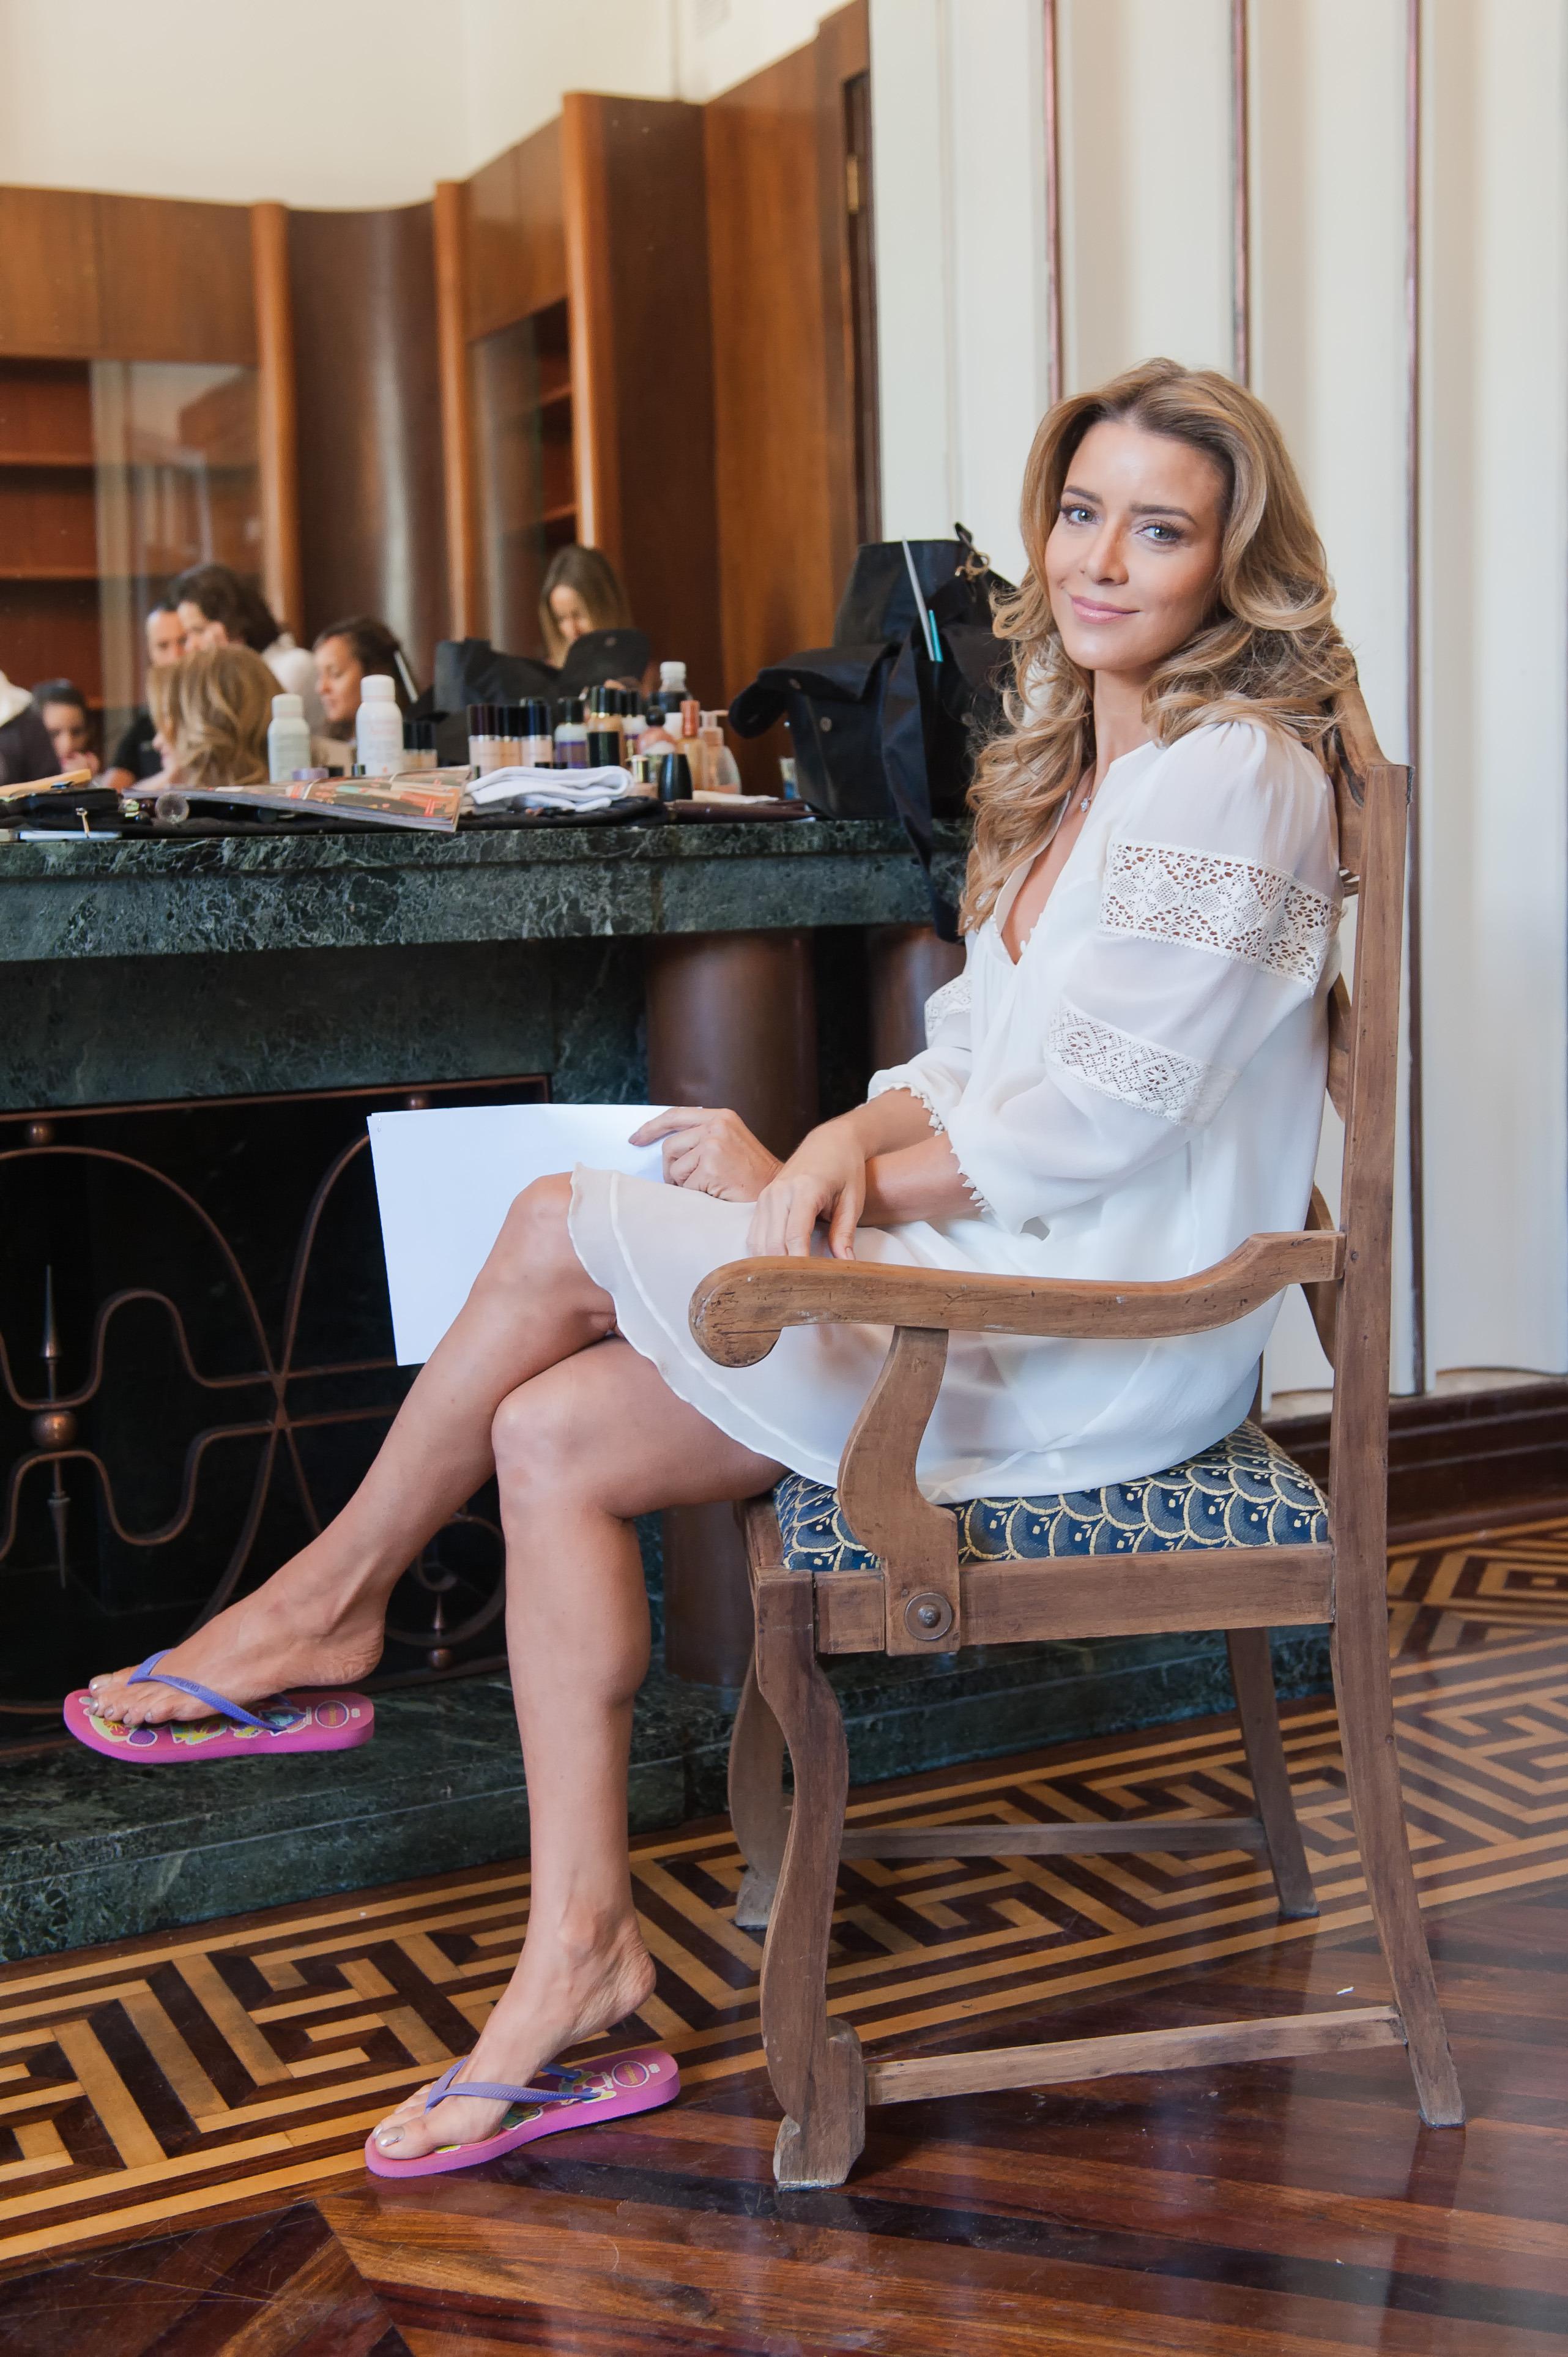 Molly McGreevey nude photos 2019